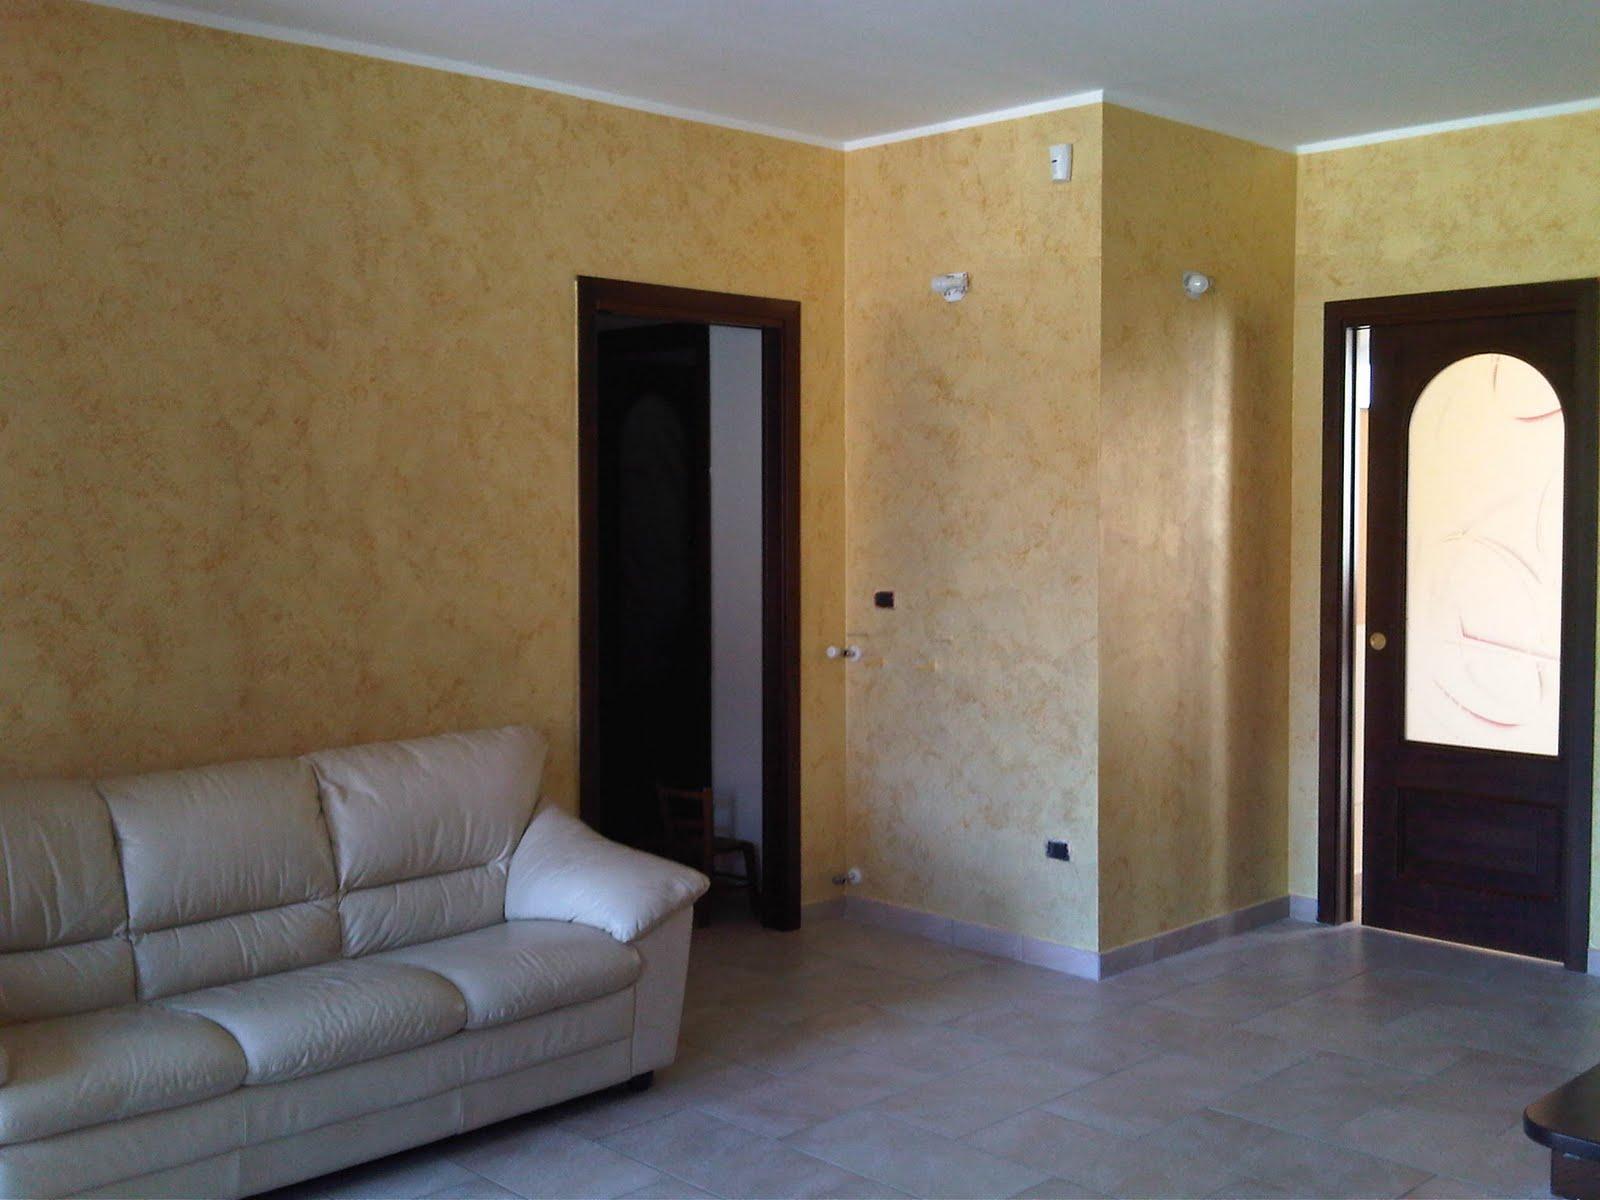 Idee Pitture Per Interni : La migliore pittura per interni. top una pittura in emulsione